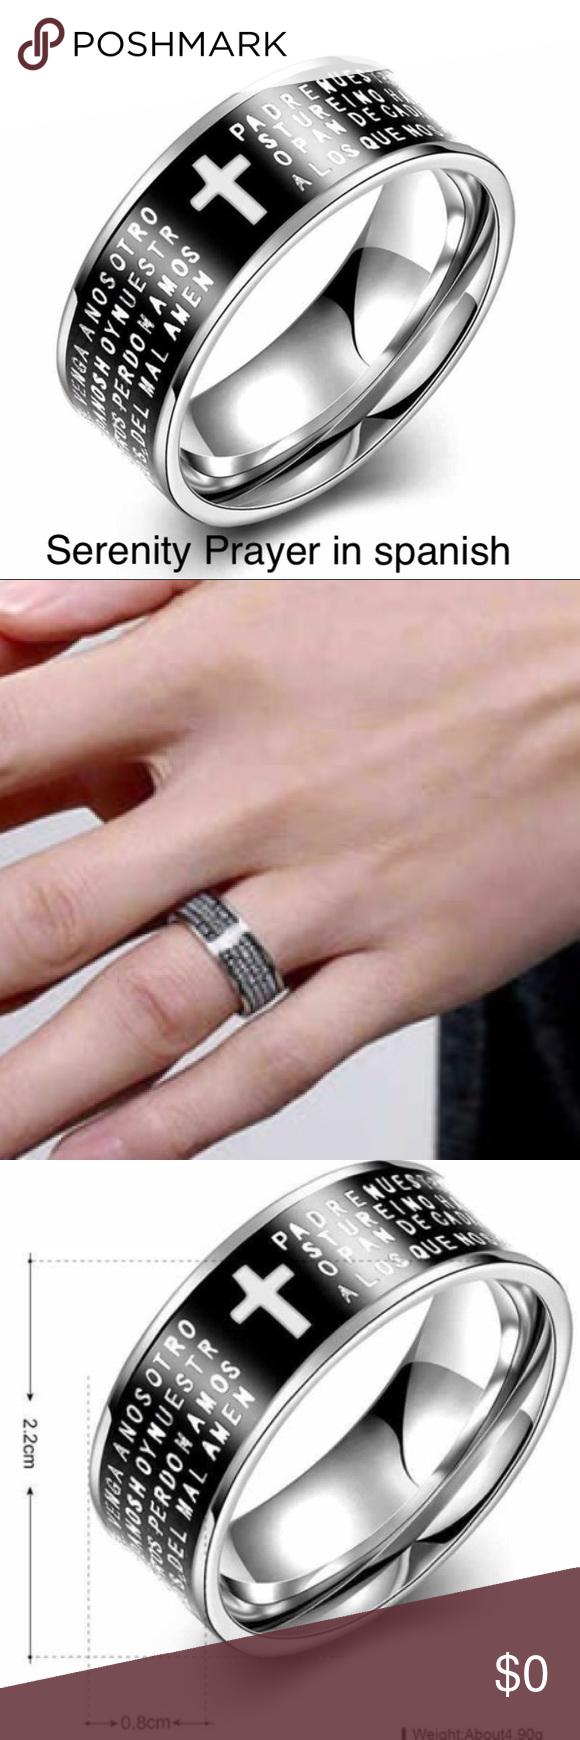 Spanish Serenity Prayer ring | Serenity, Sterling silver and Ring